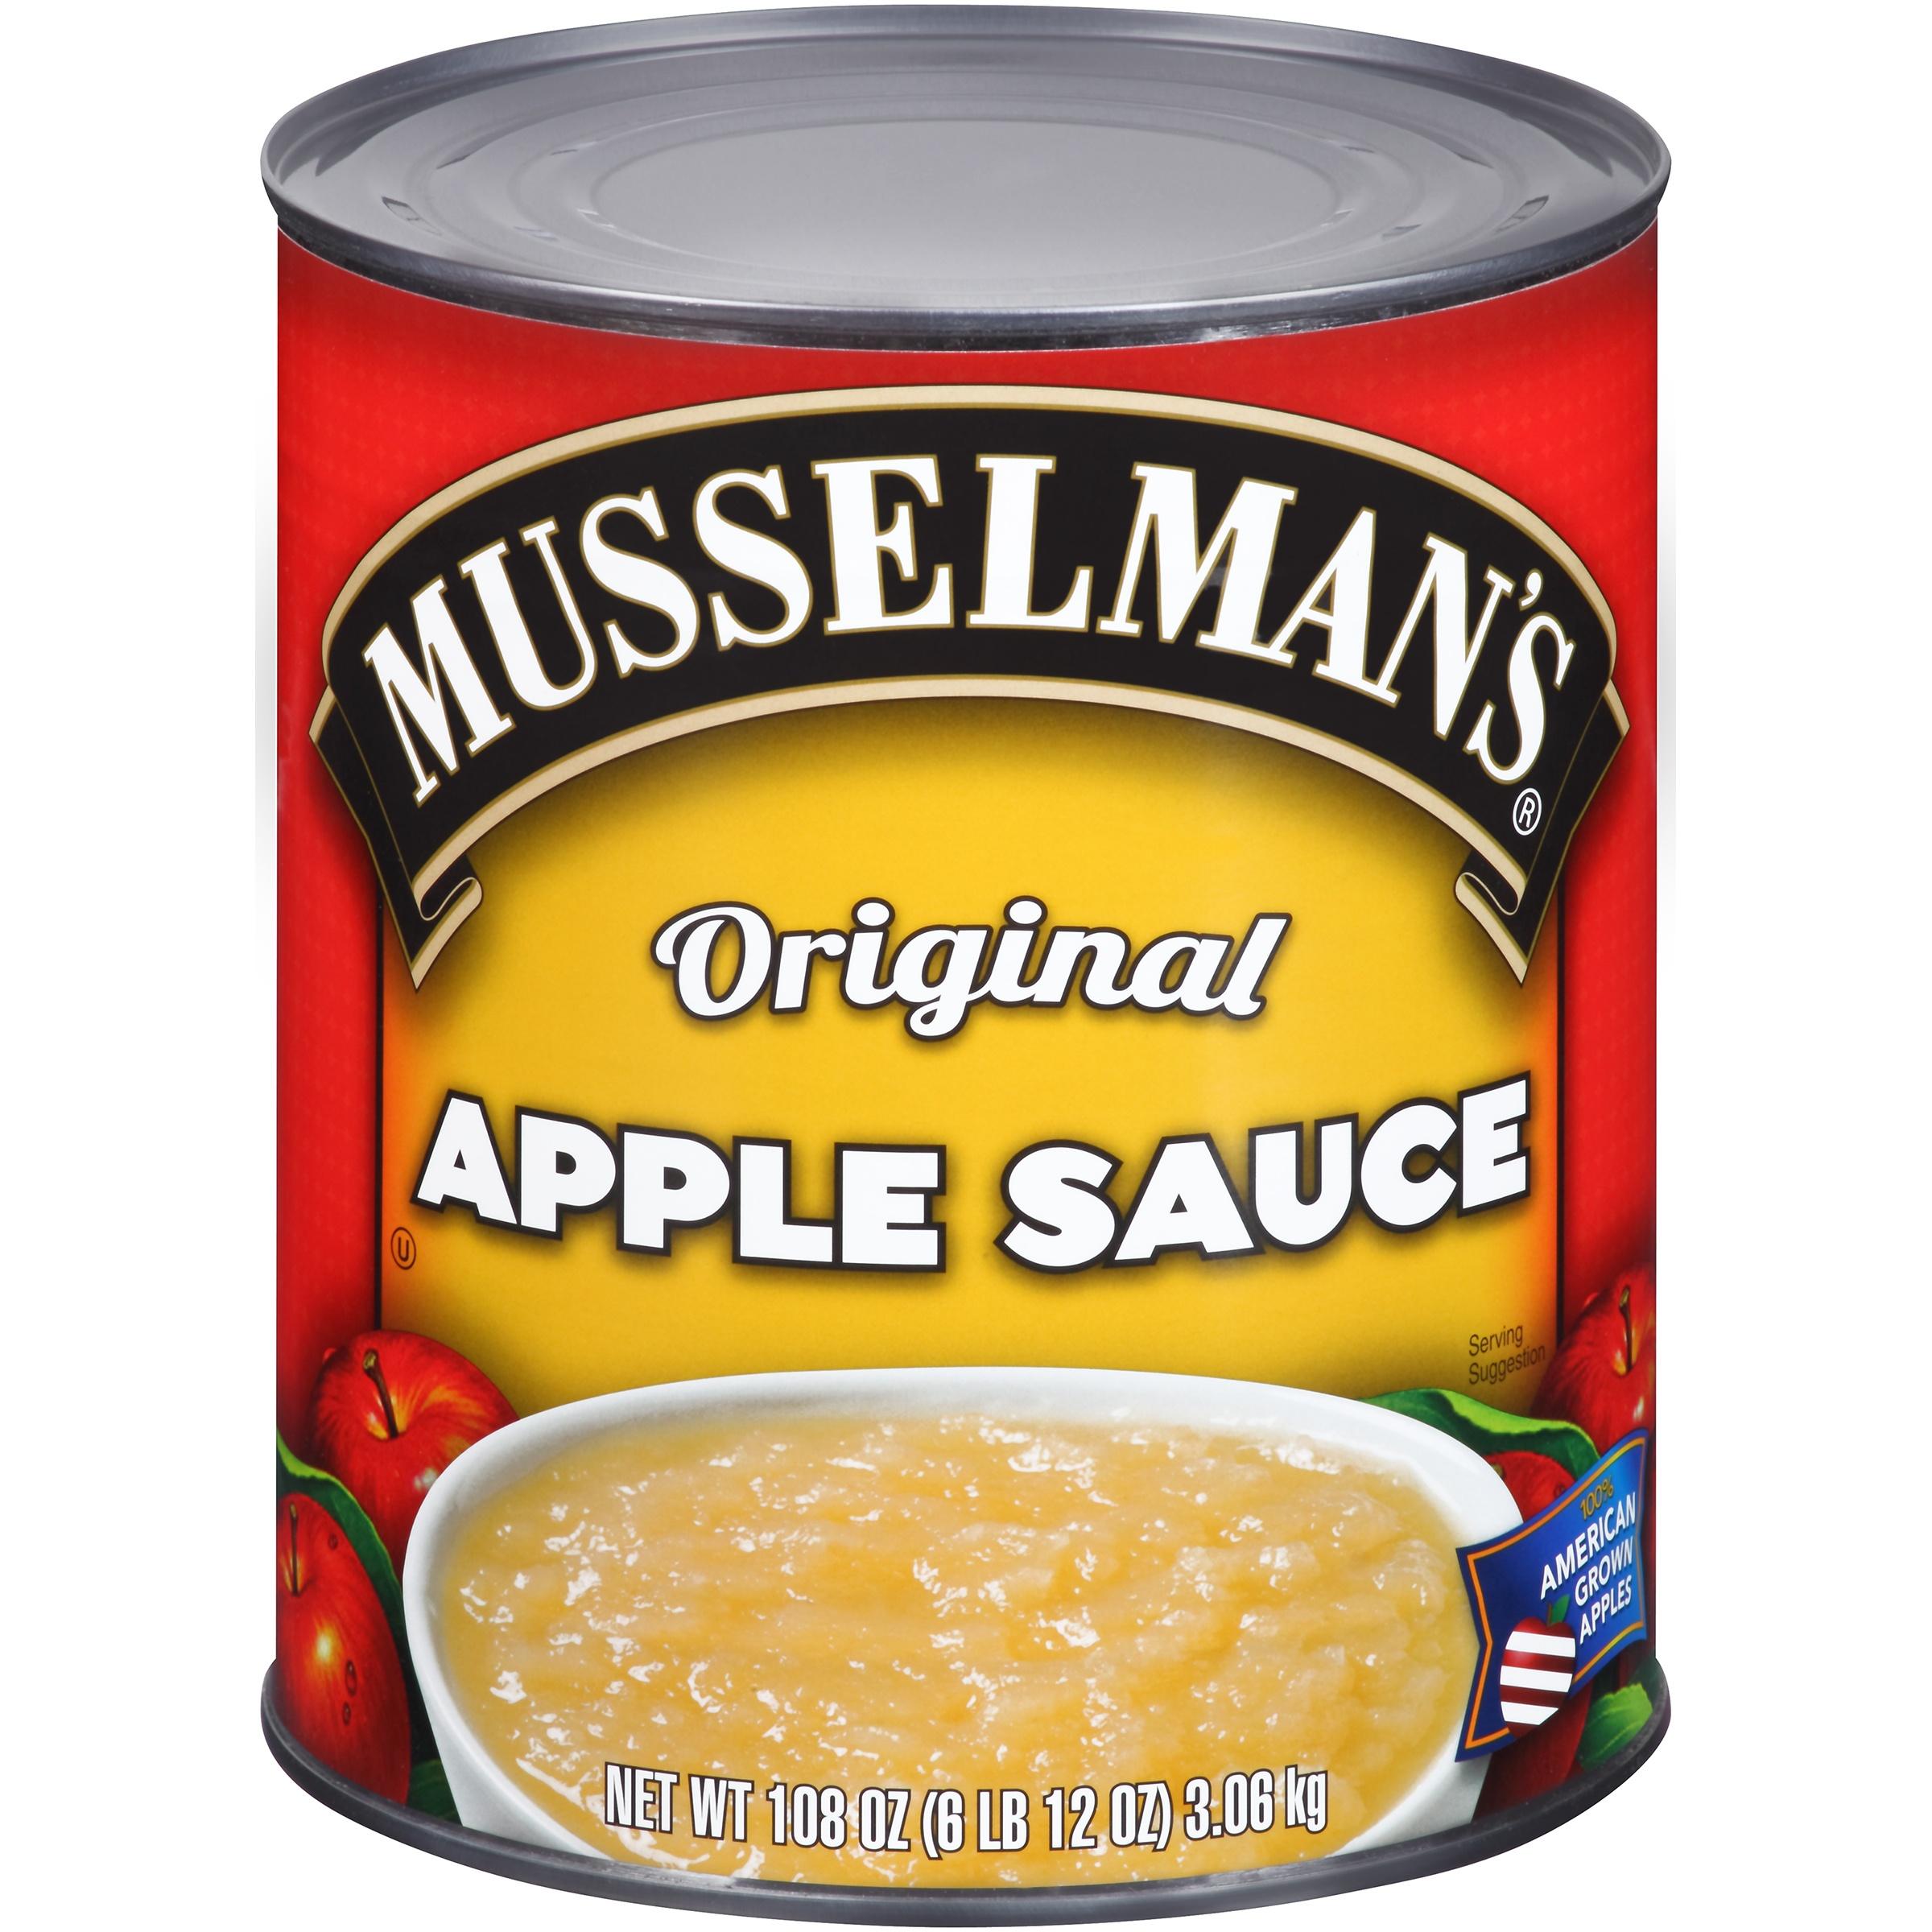 Musselman's Original Applesauce 108oz